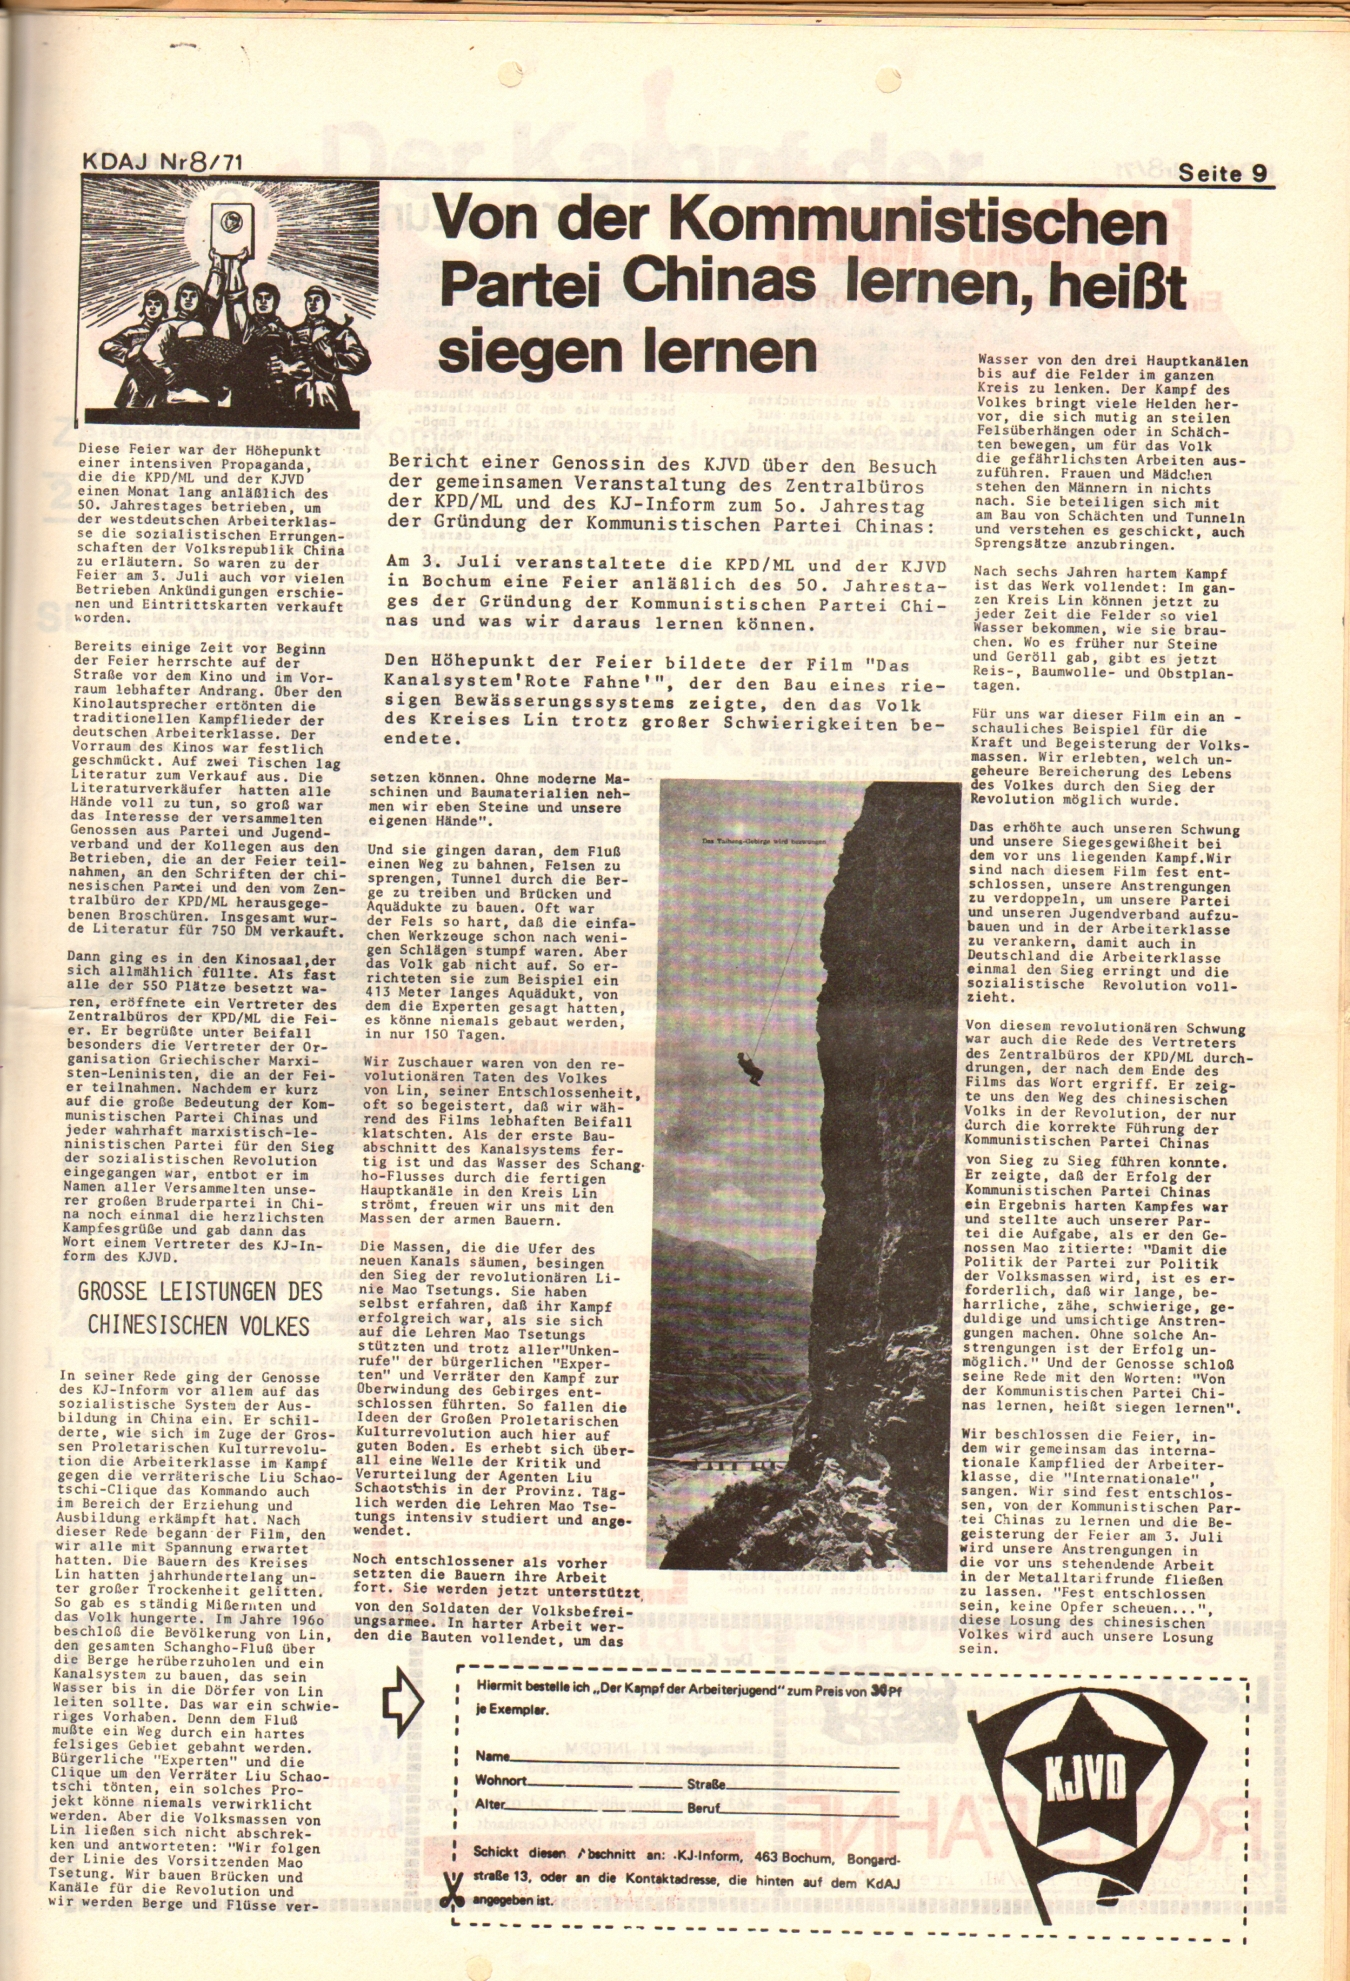 KDAJ, 2. Jg., August 1971, Nr. 8, Seite 9